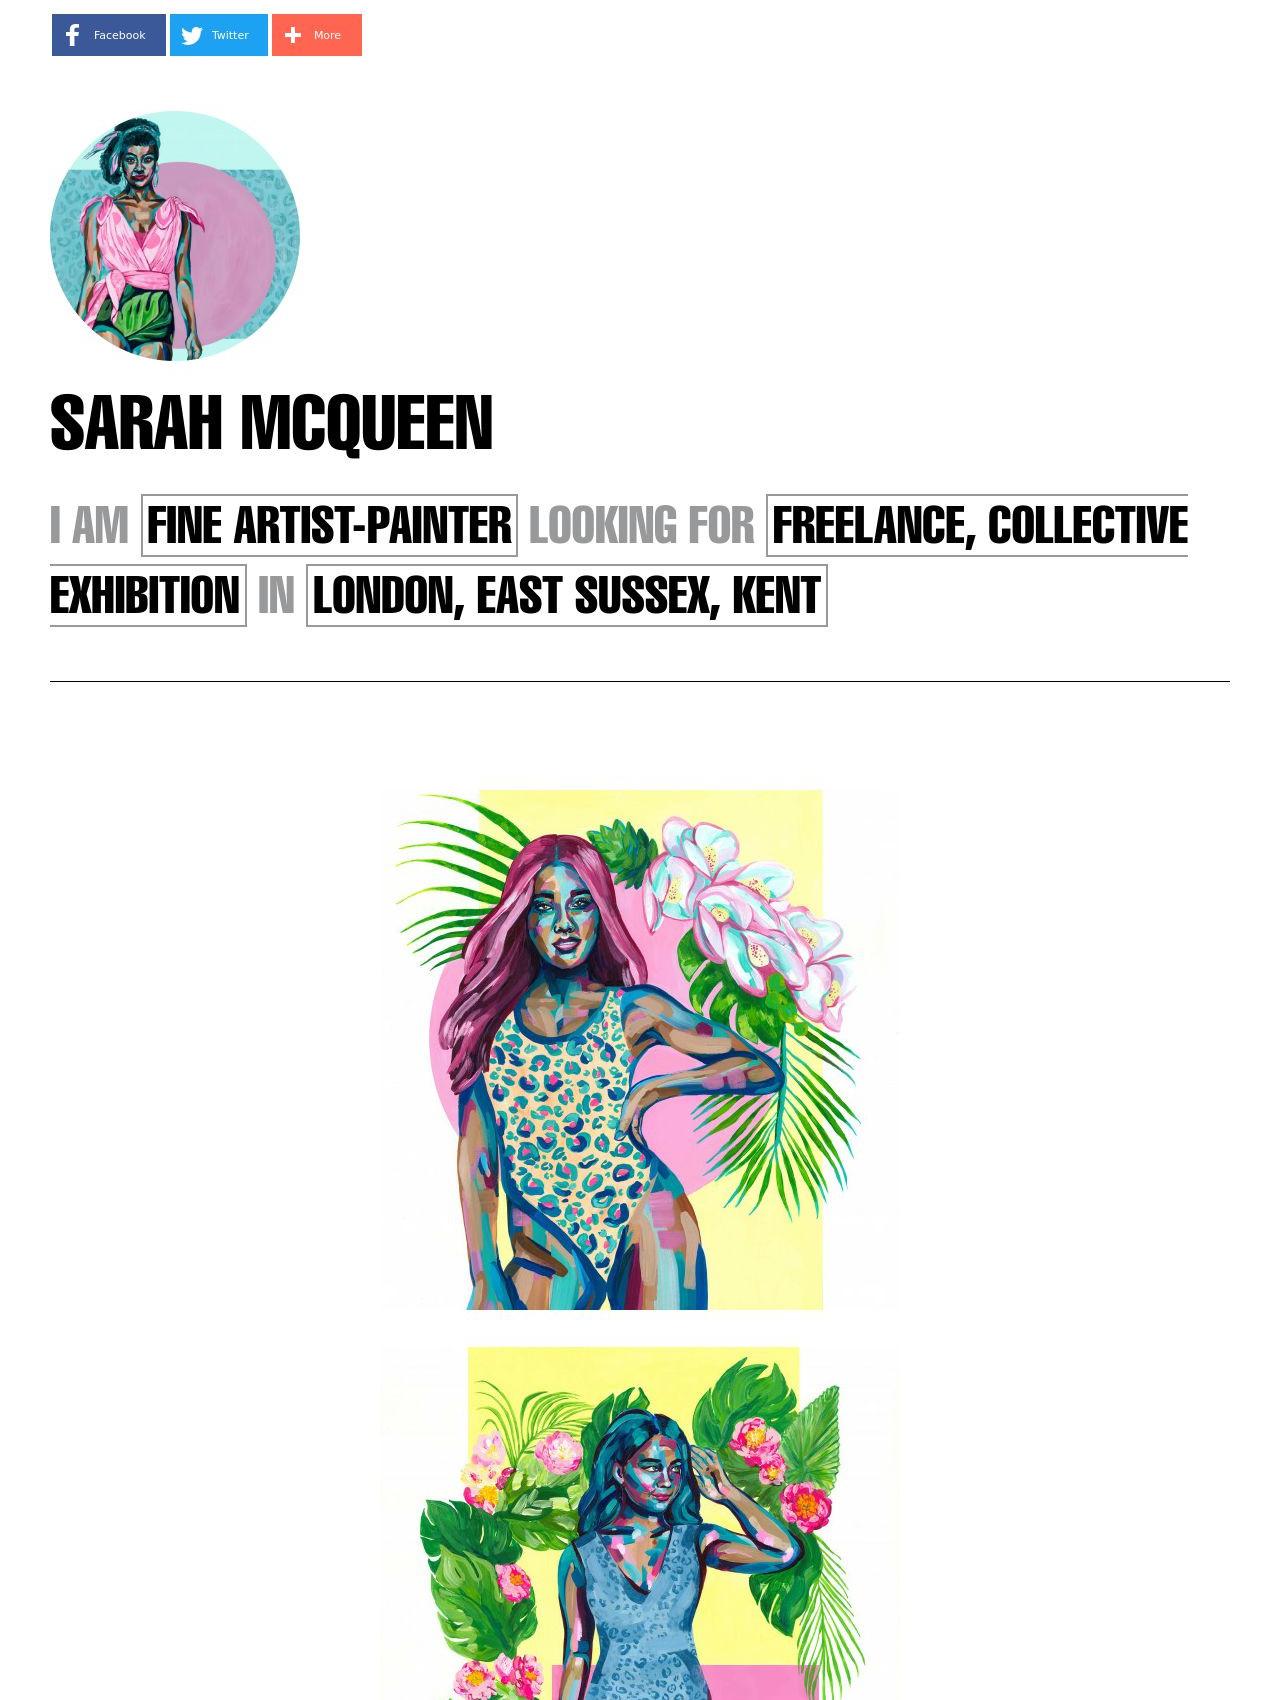 Sarah McQueen